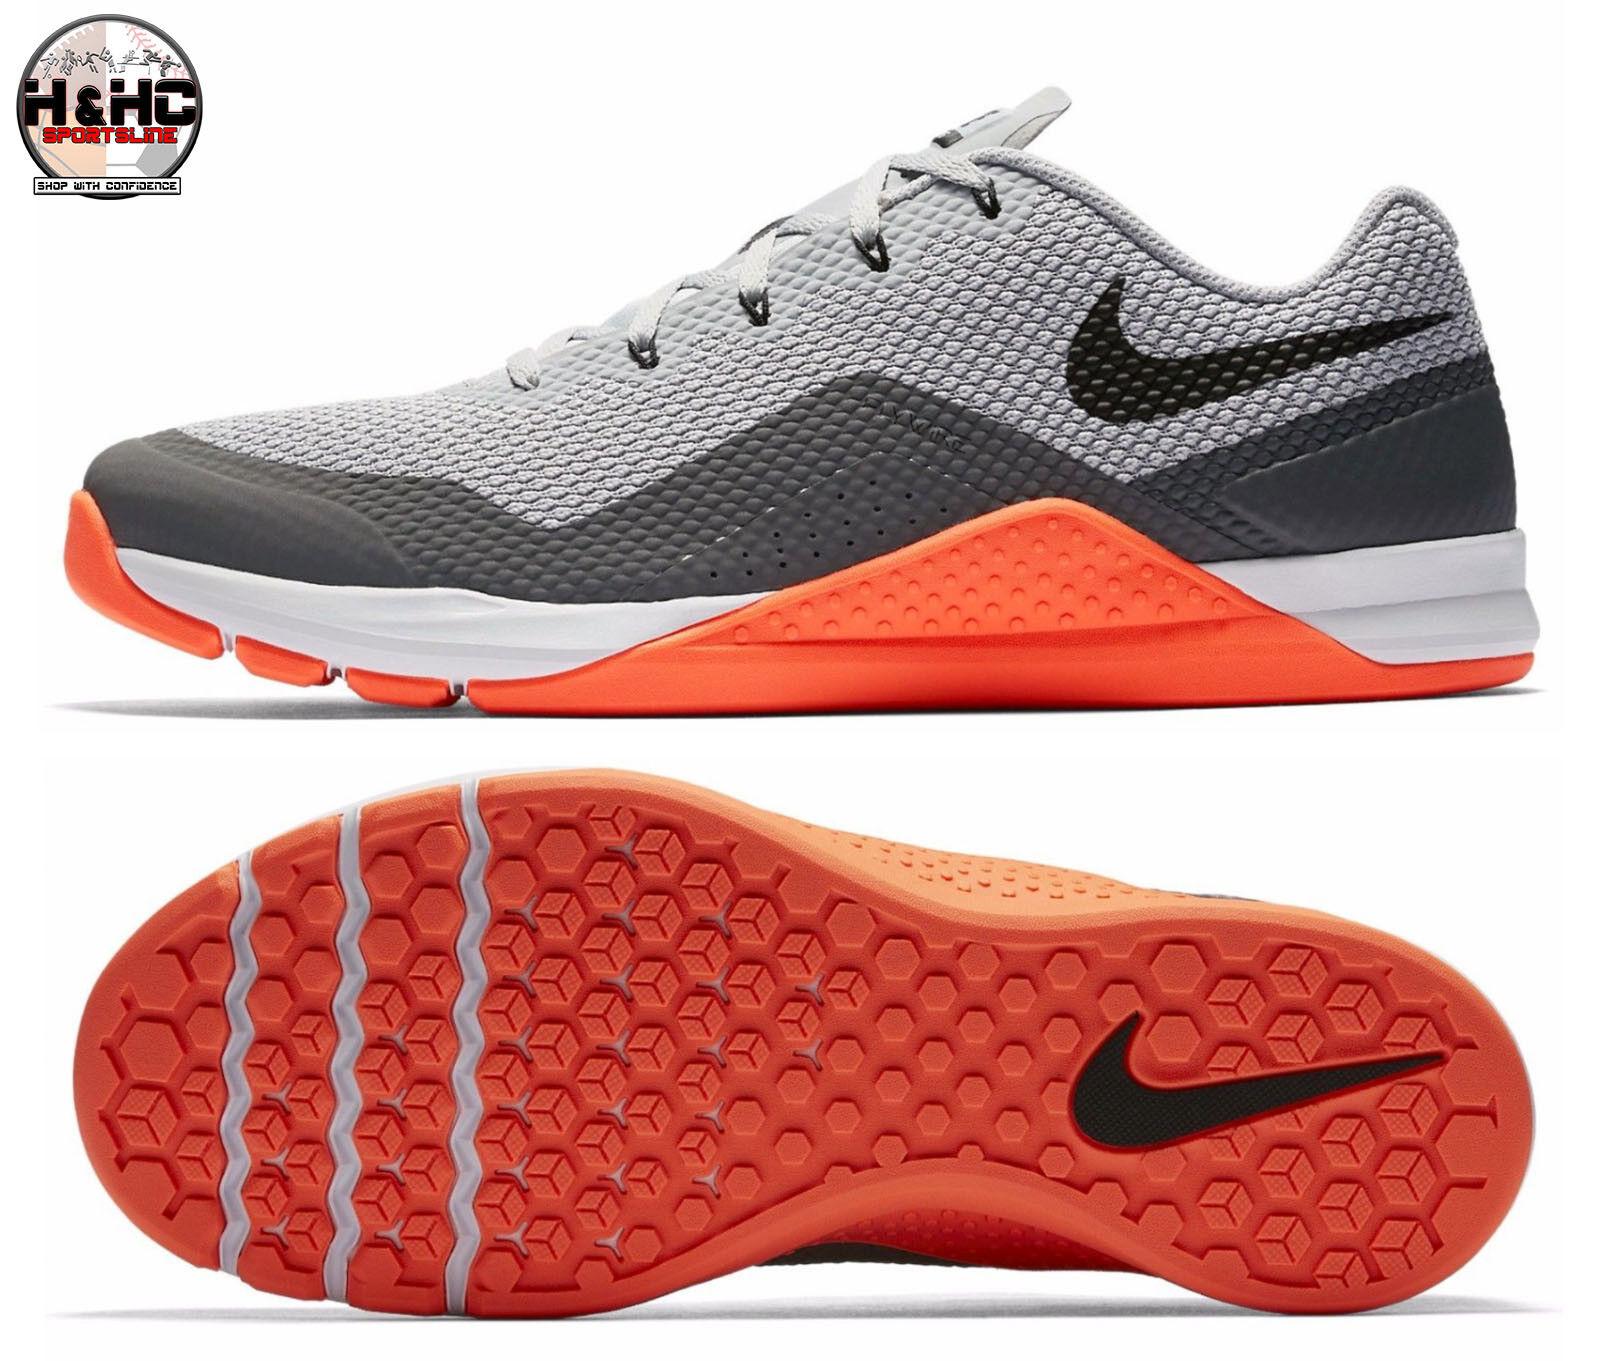 Nike Metcon Repper DSX 898048 006 Grey/Black-Crimson Men's Training Shoes Sz 14